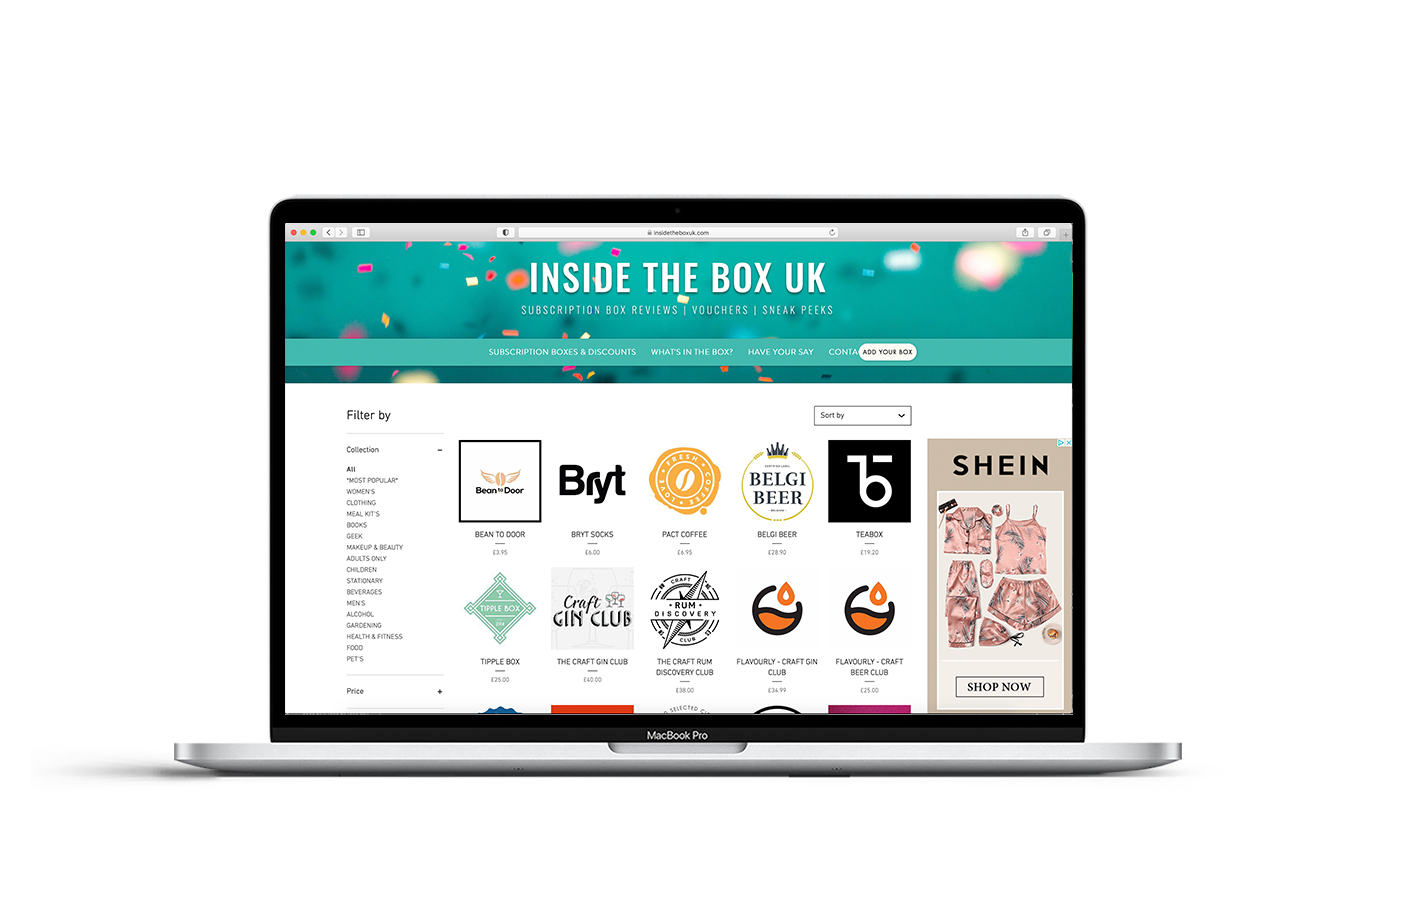 Insidetheboxuk_macbook_Mockup2.png